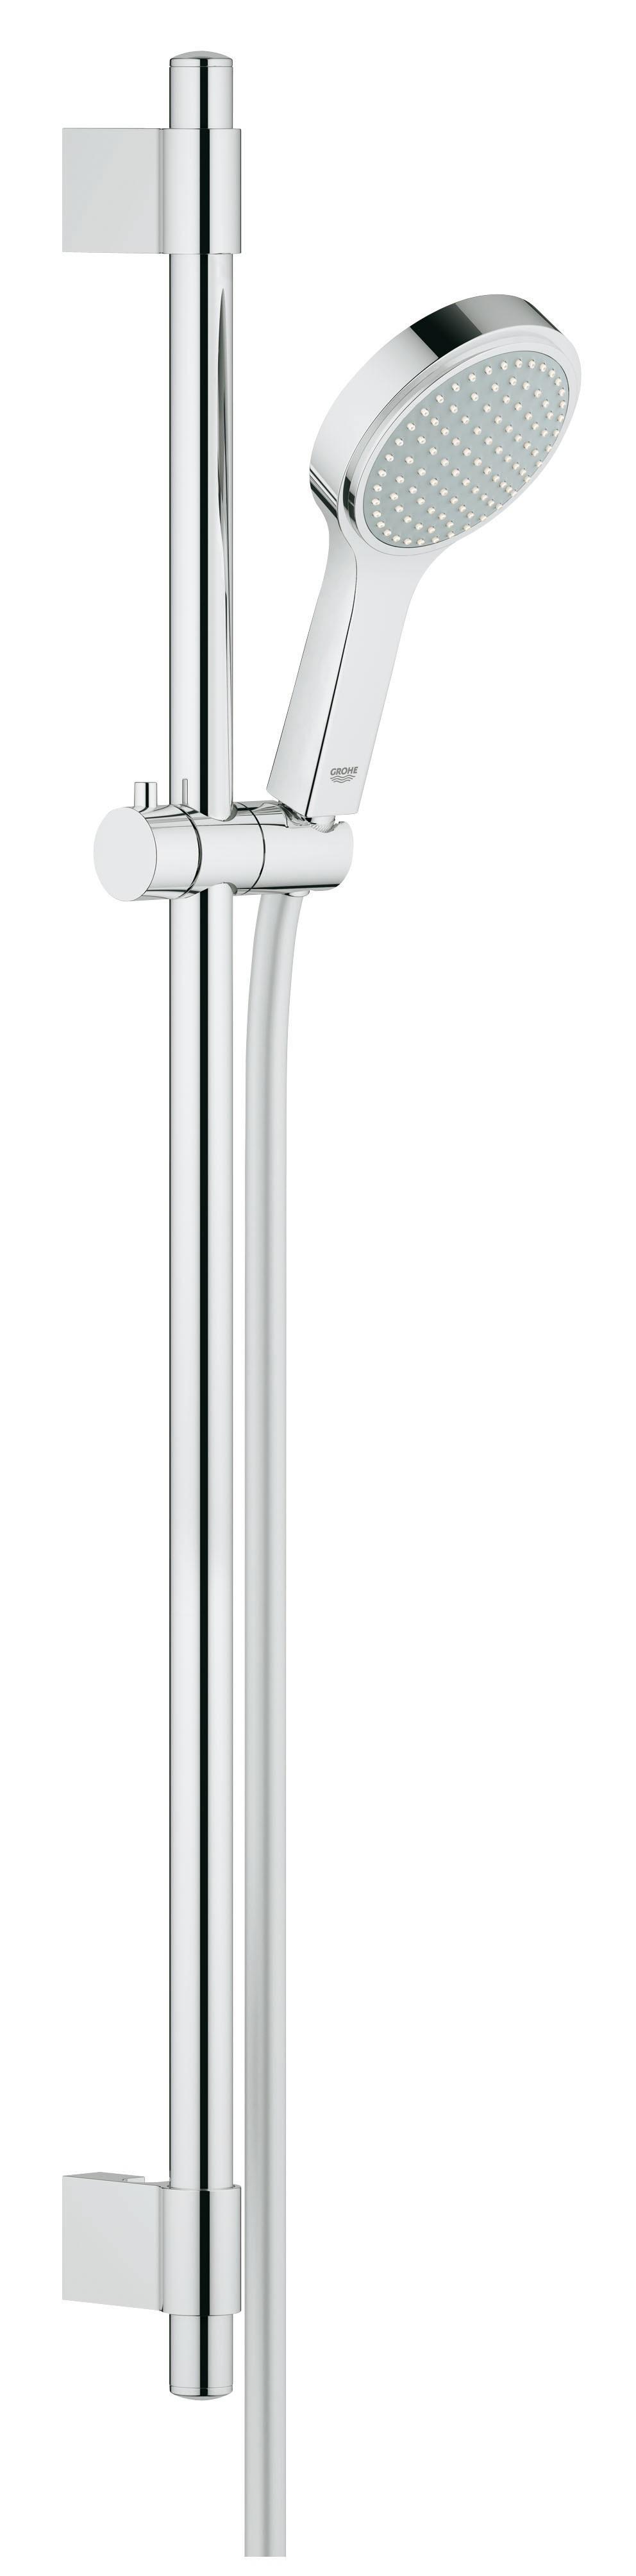 Grohe 27755000 Power&Soul Cosmopolitan 115 (ручной душ, штанга 900 мм, шланг 1750 мм), хром